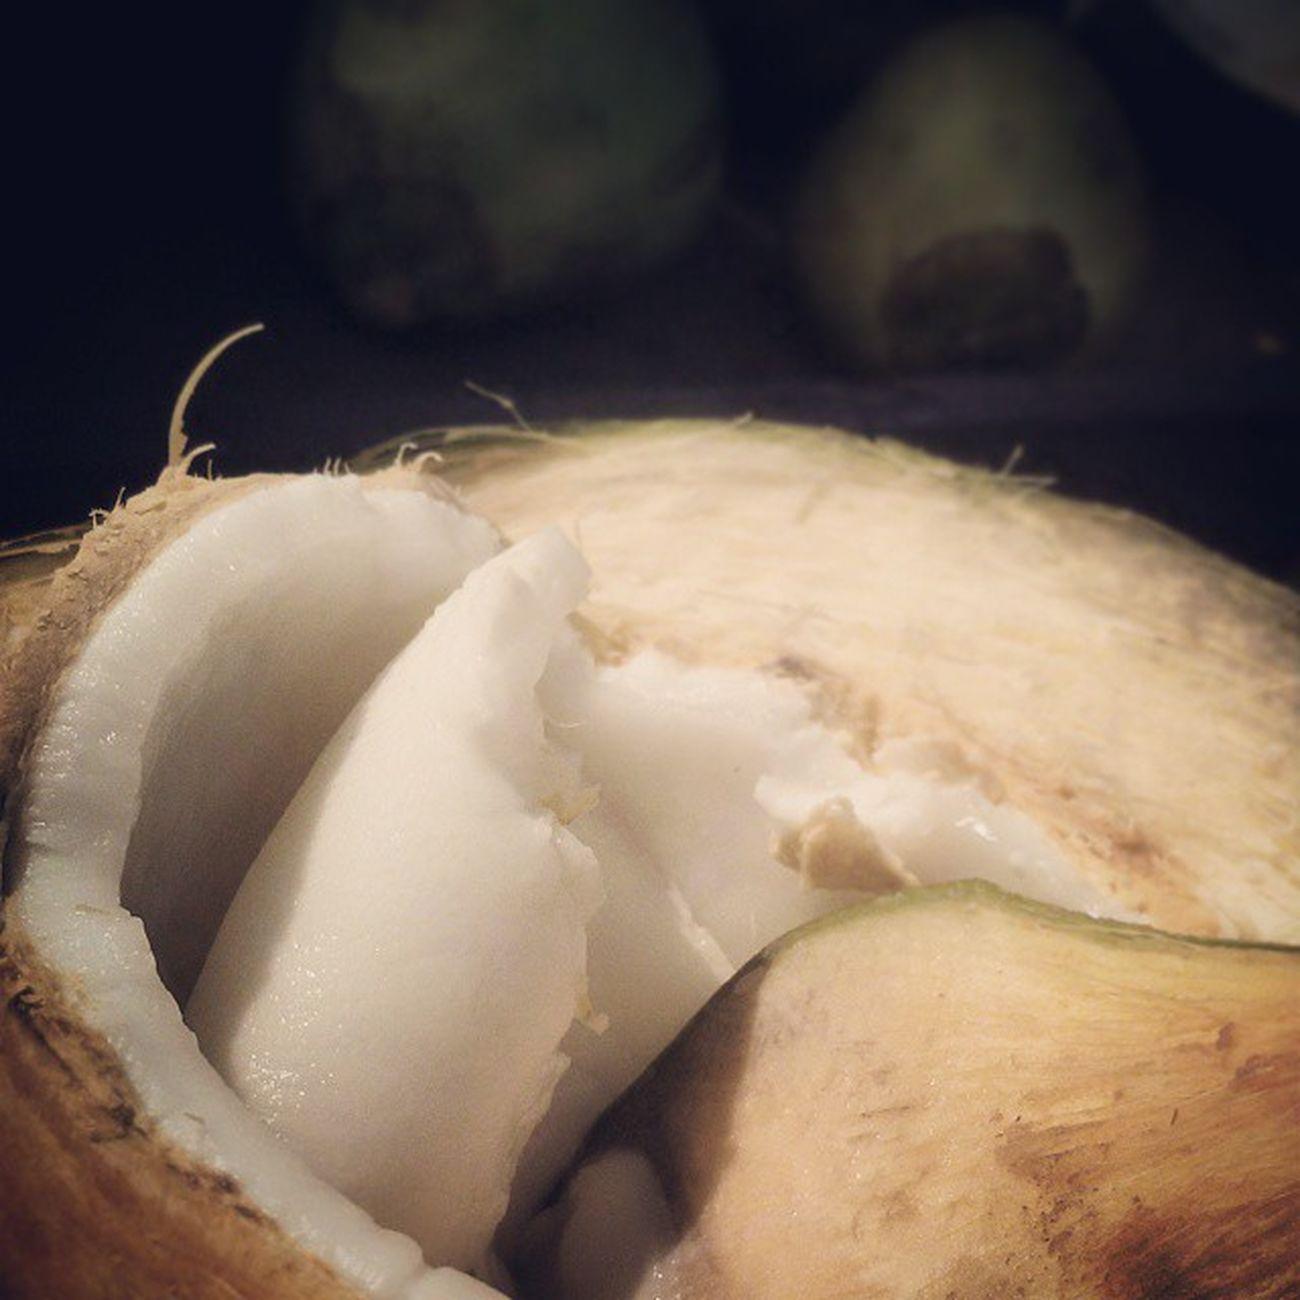 Sunday Food_love Health Consious tender_coco_nutyummmmmluv_fo_itsrrrrup_srrrrruppp😍